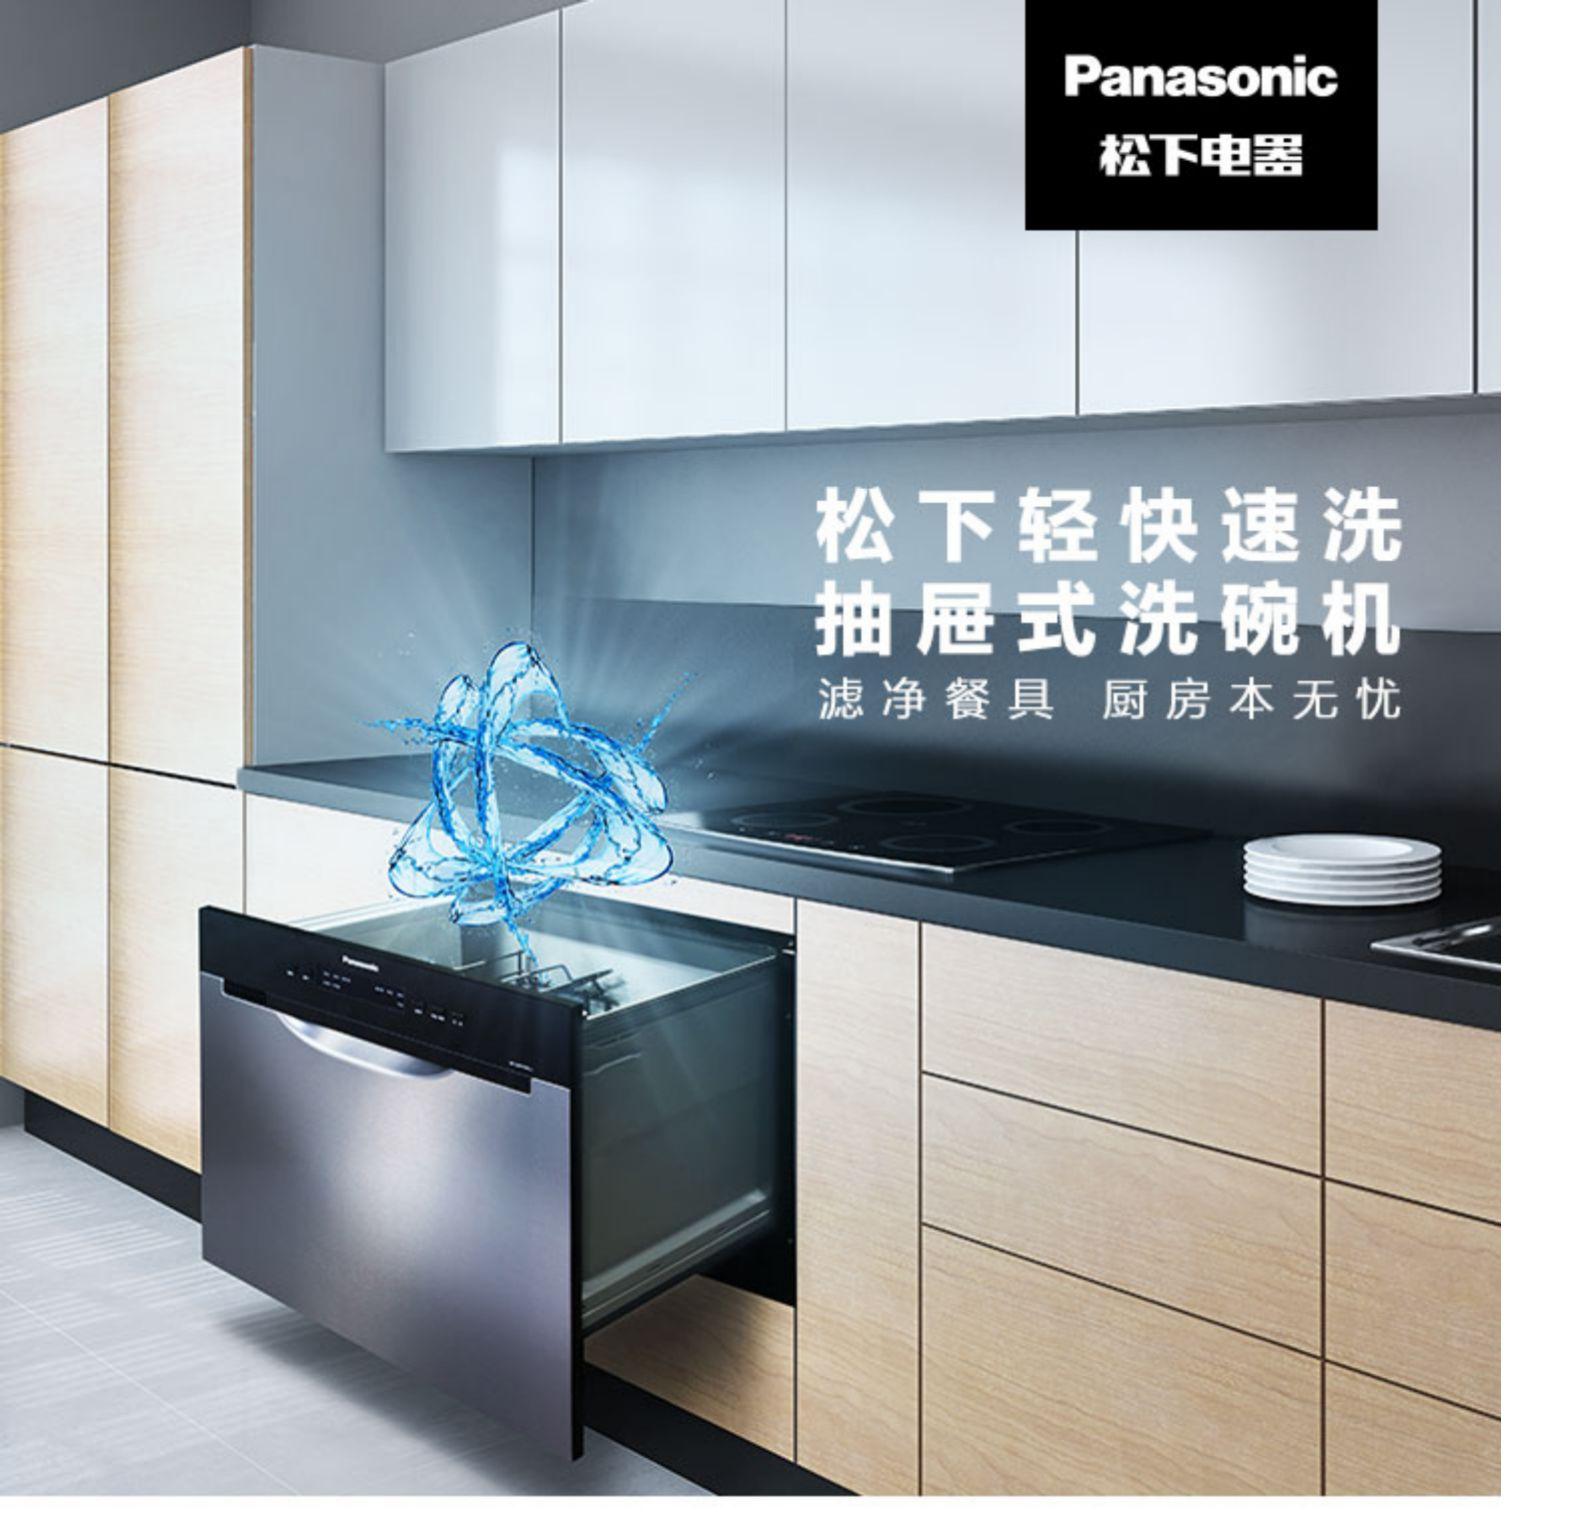 Panasonic/松下洗碗机怎么样呢?评测如何?优缺点揭秘必看